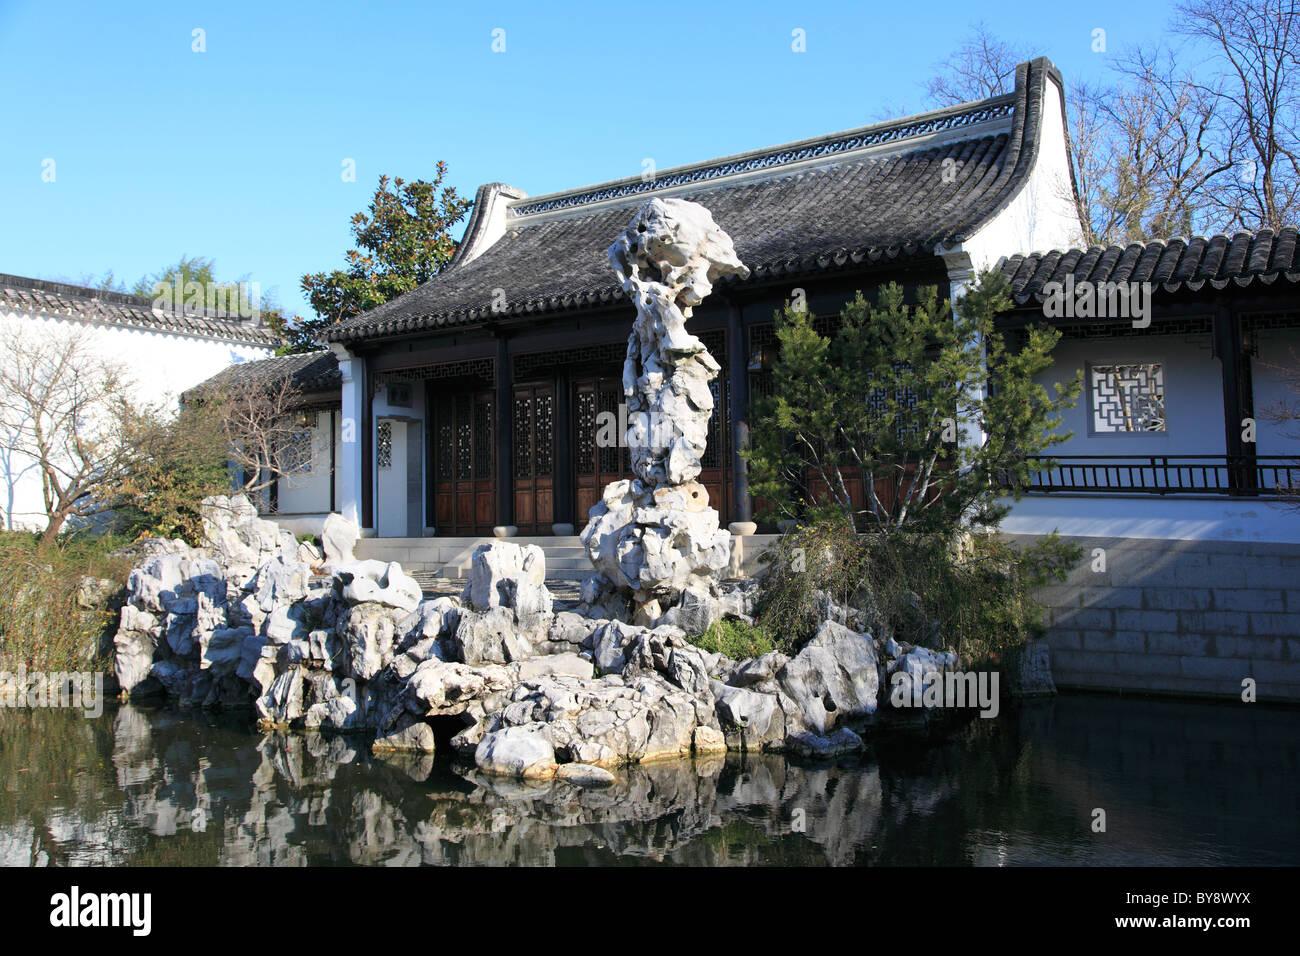 Chinese Scholaru0027s Garden, Snug Harbor Cultural Center And Botanical Garden,  Richmond Terrace, Staten Island, New York City